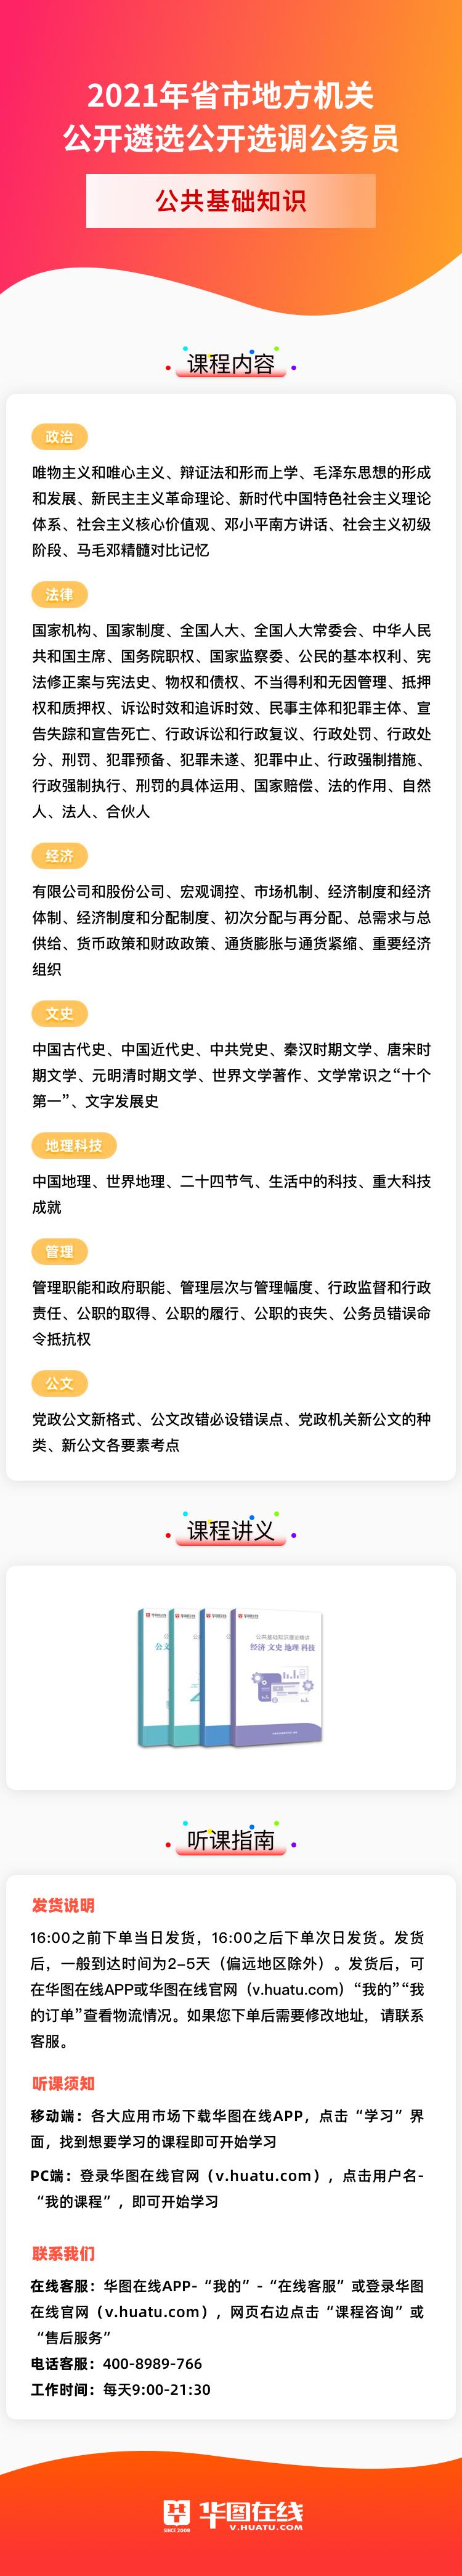 http://upload.htexam.com/userimg/1614066942.png